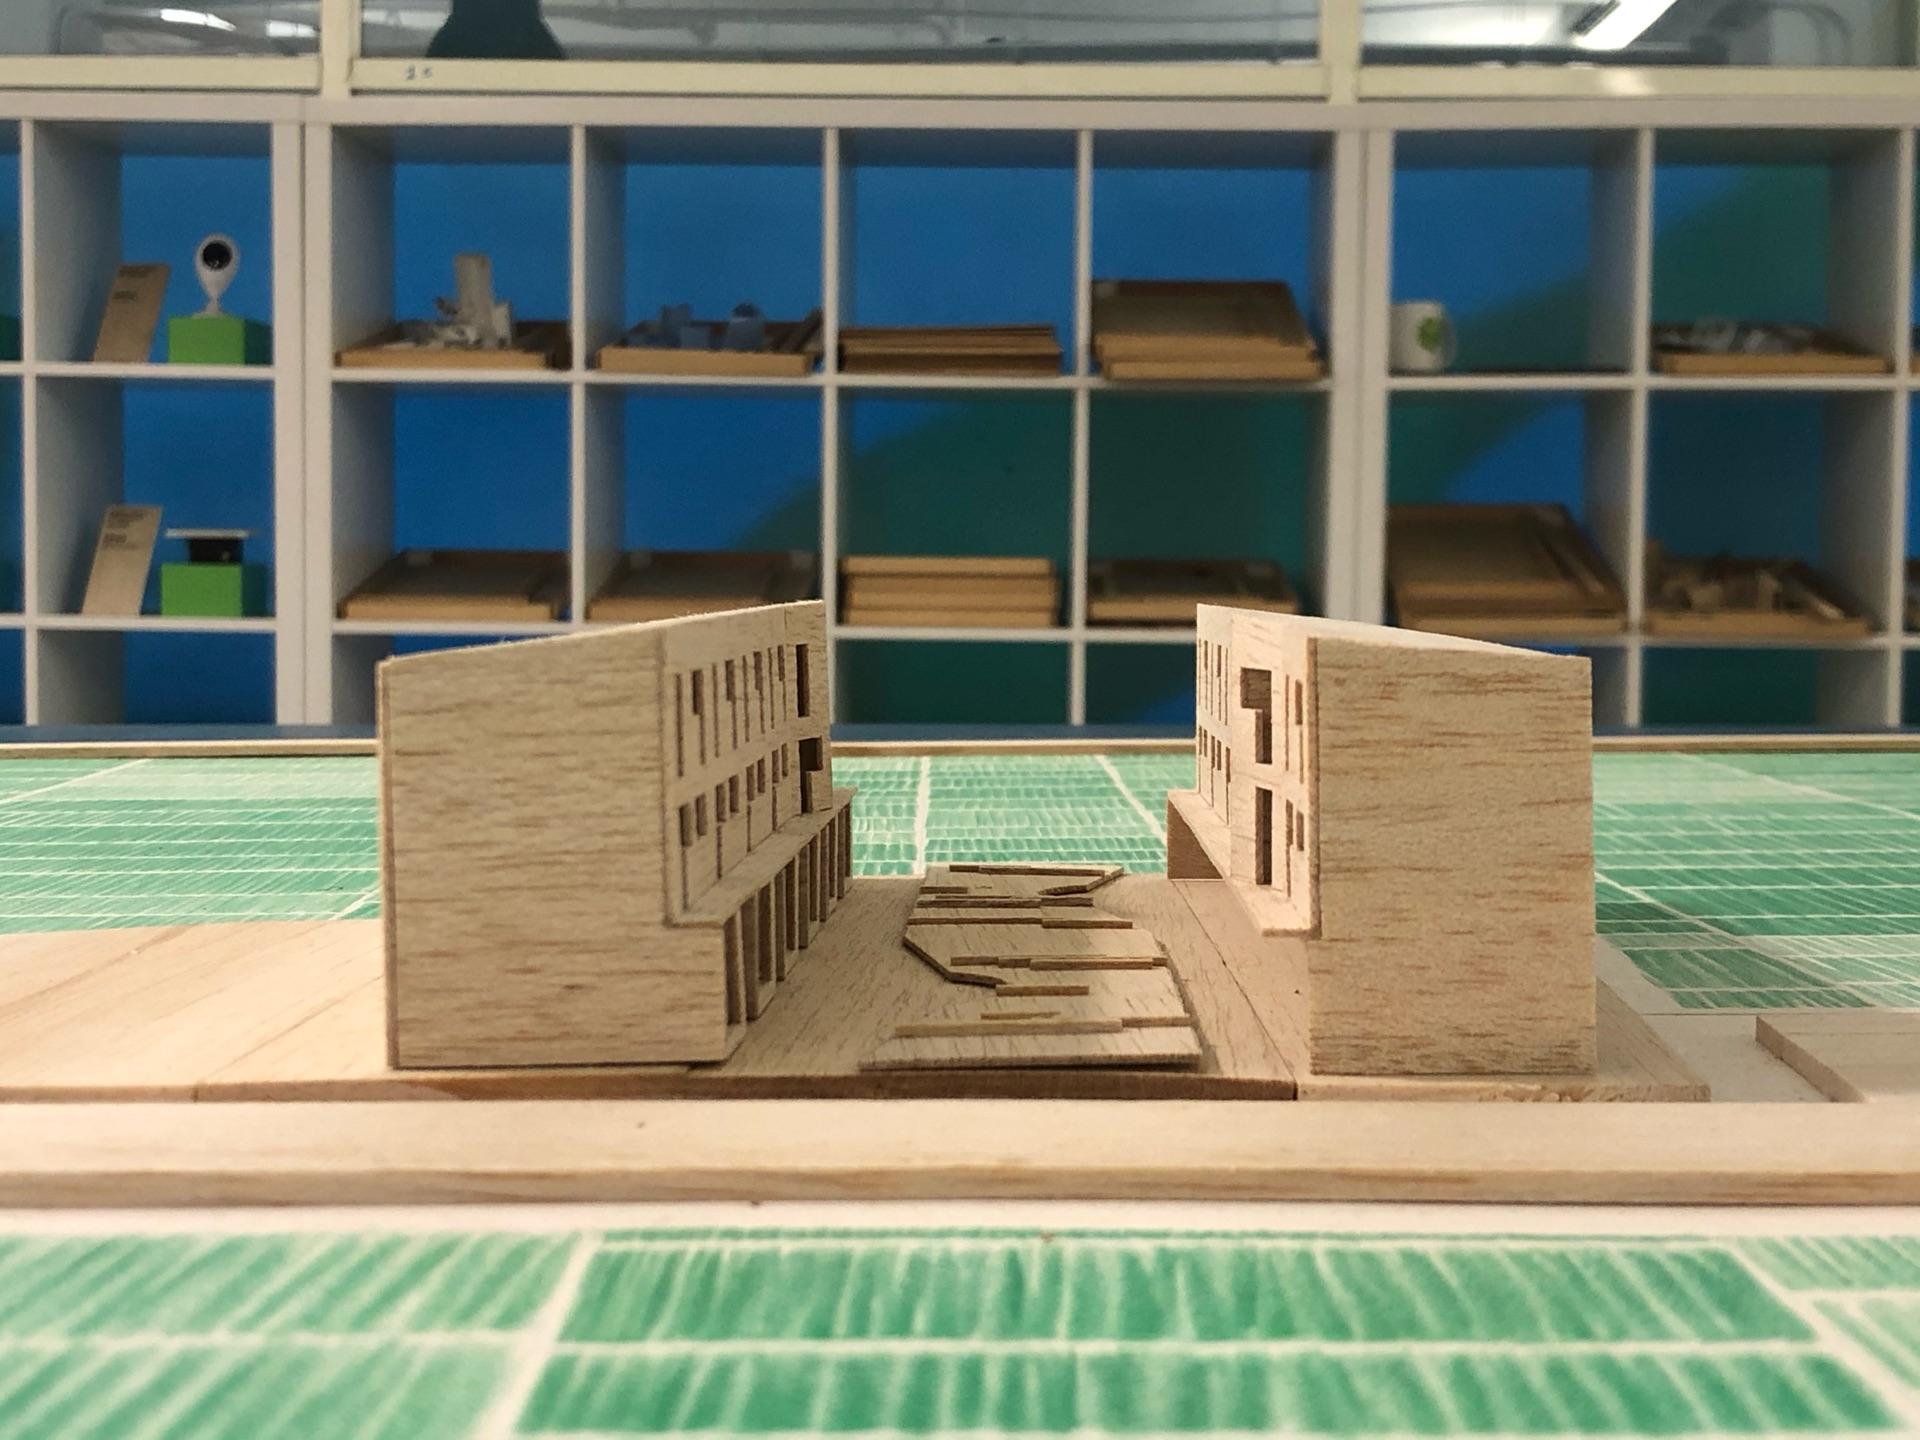 德築-DEZU-project-Zuxing-architecture-build-model-1